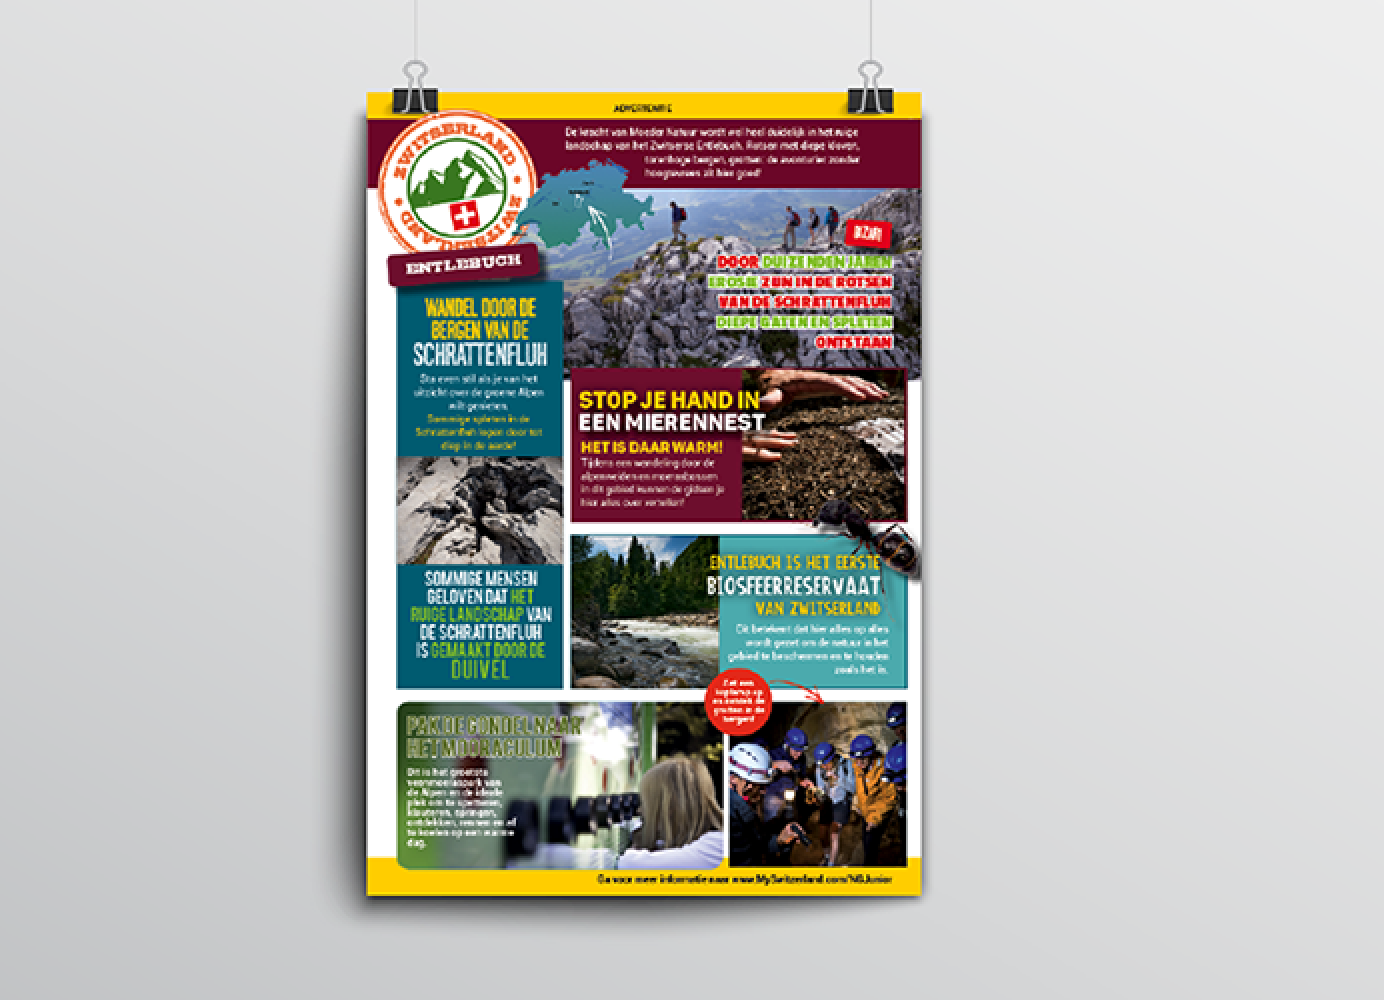 Advertentie Zwitserland Toerisme voor de regio Entlebuch